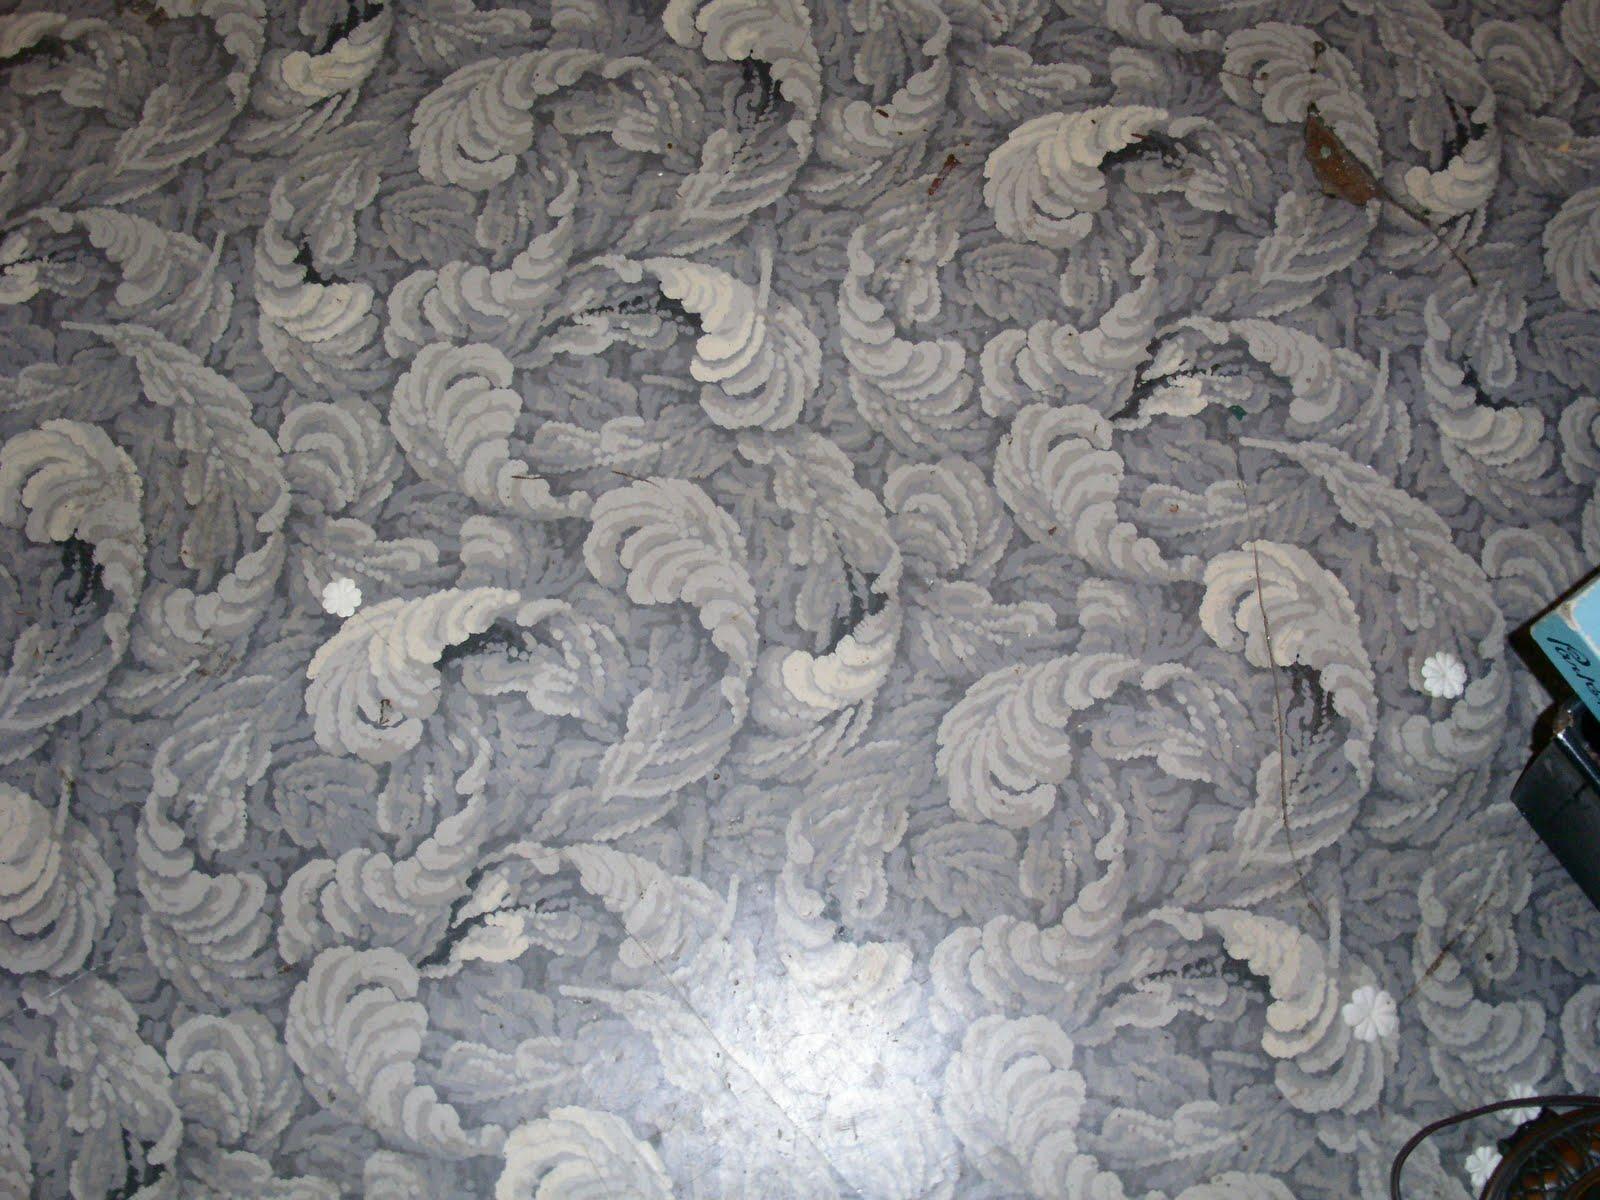 Carrelage Design tapis lino : all my favorite things: linoleum carpets ...childrenu0026#39;s pattern and ...